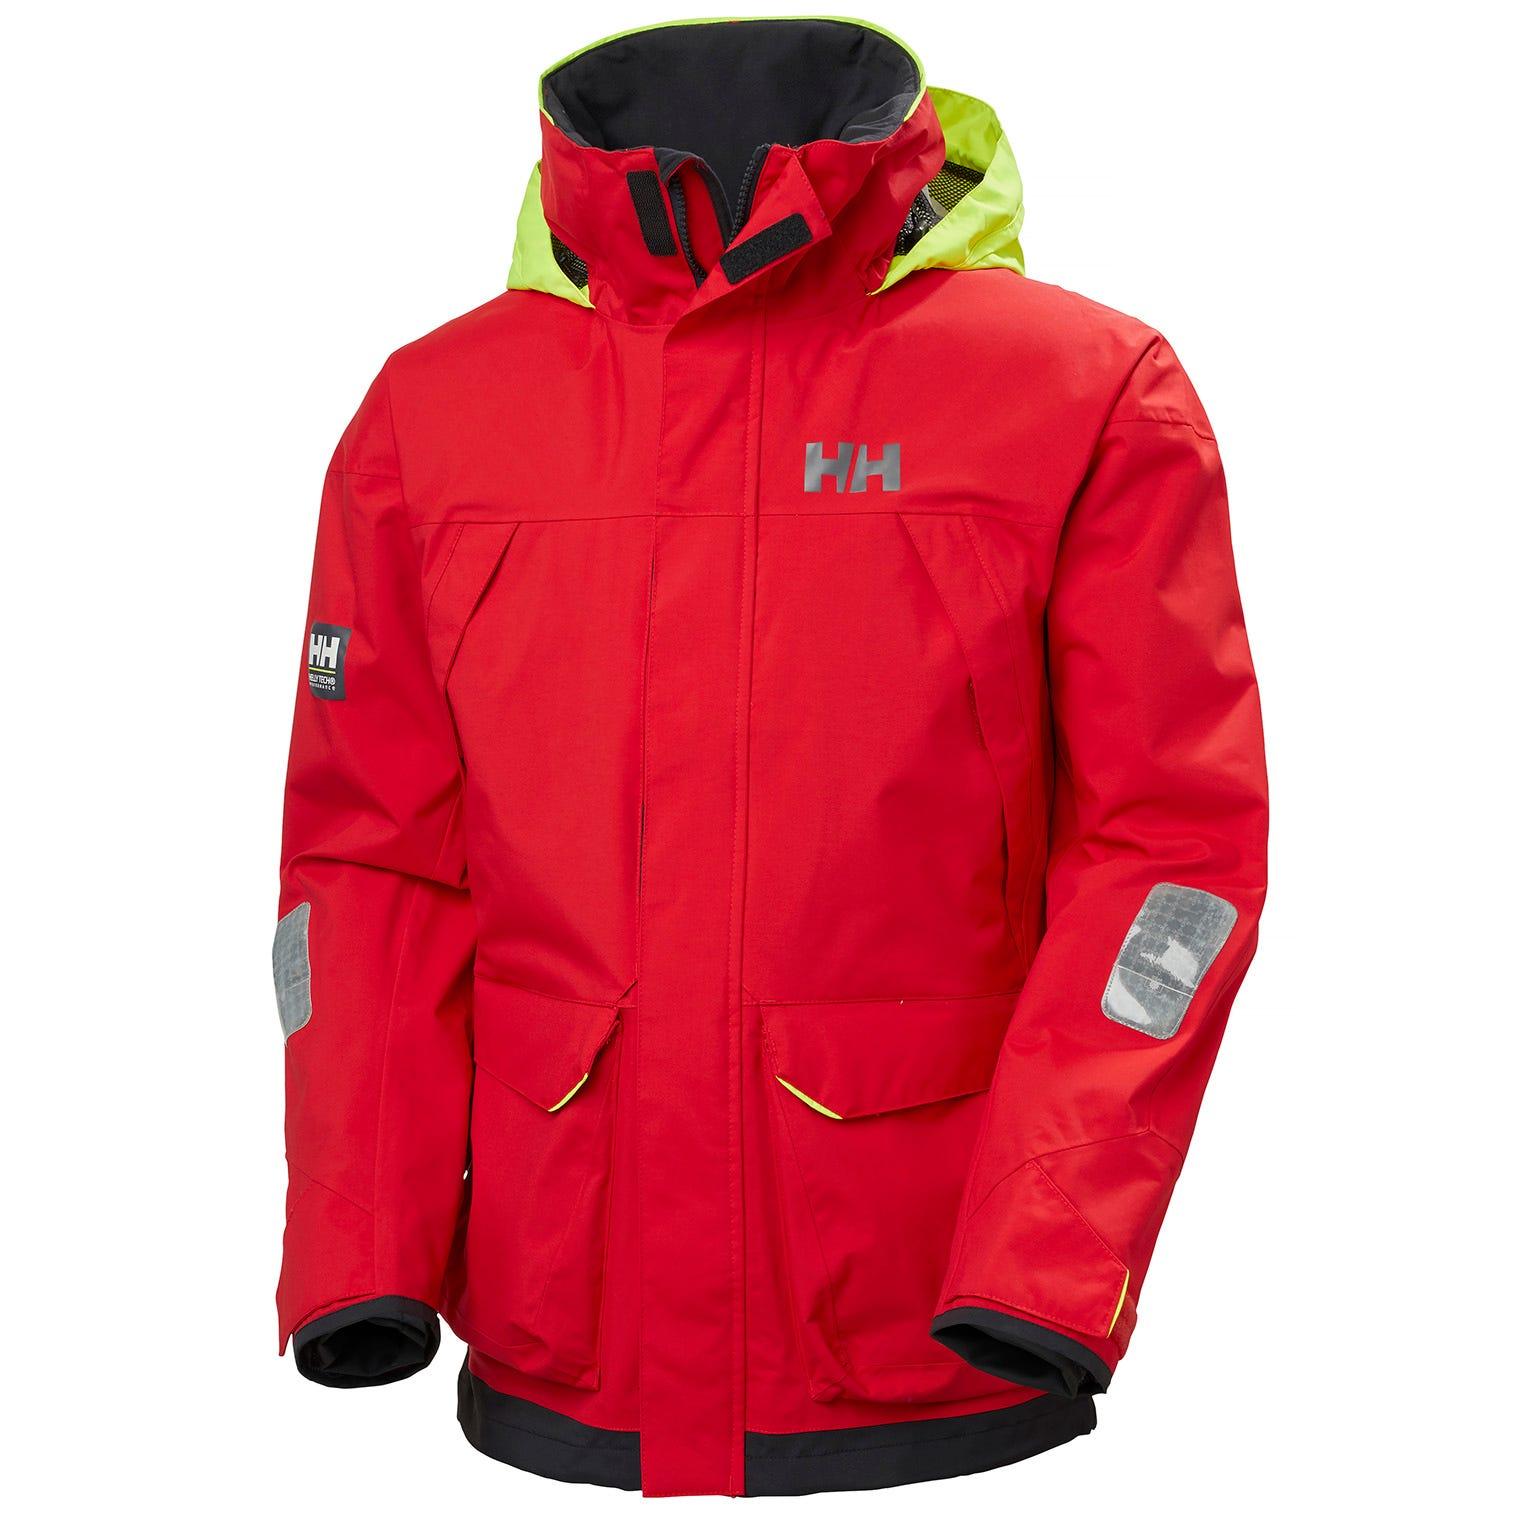 Helly Hansen Mens Pier 3.0 Coastal Sailing Jacket Red XL